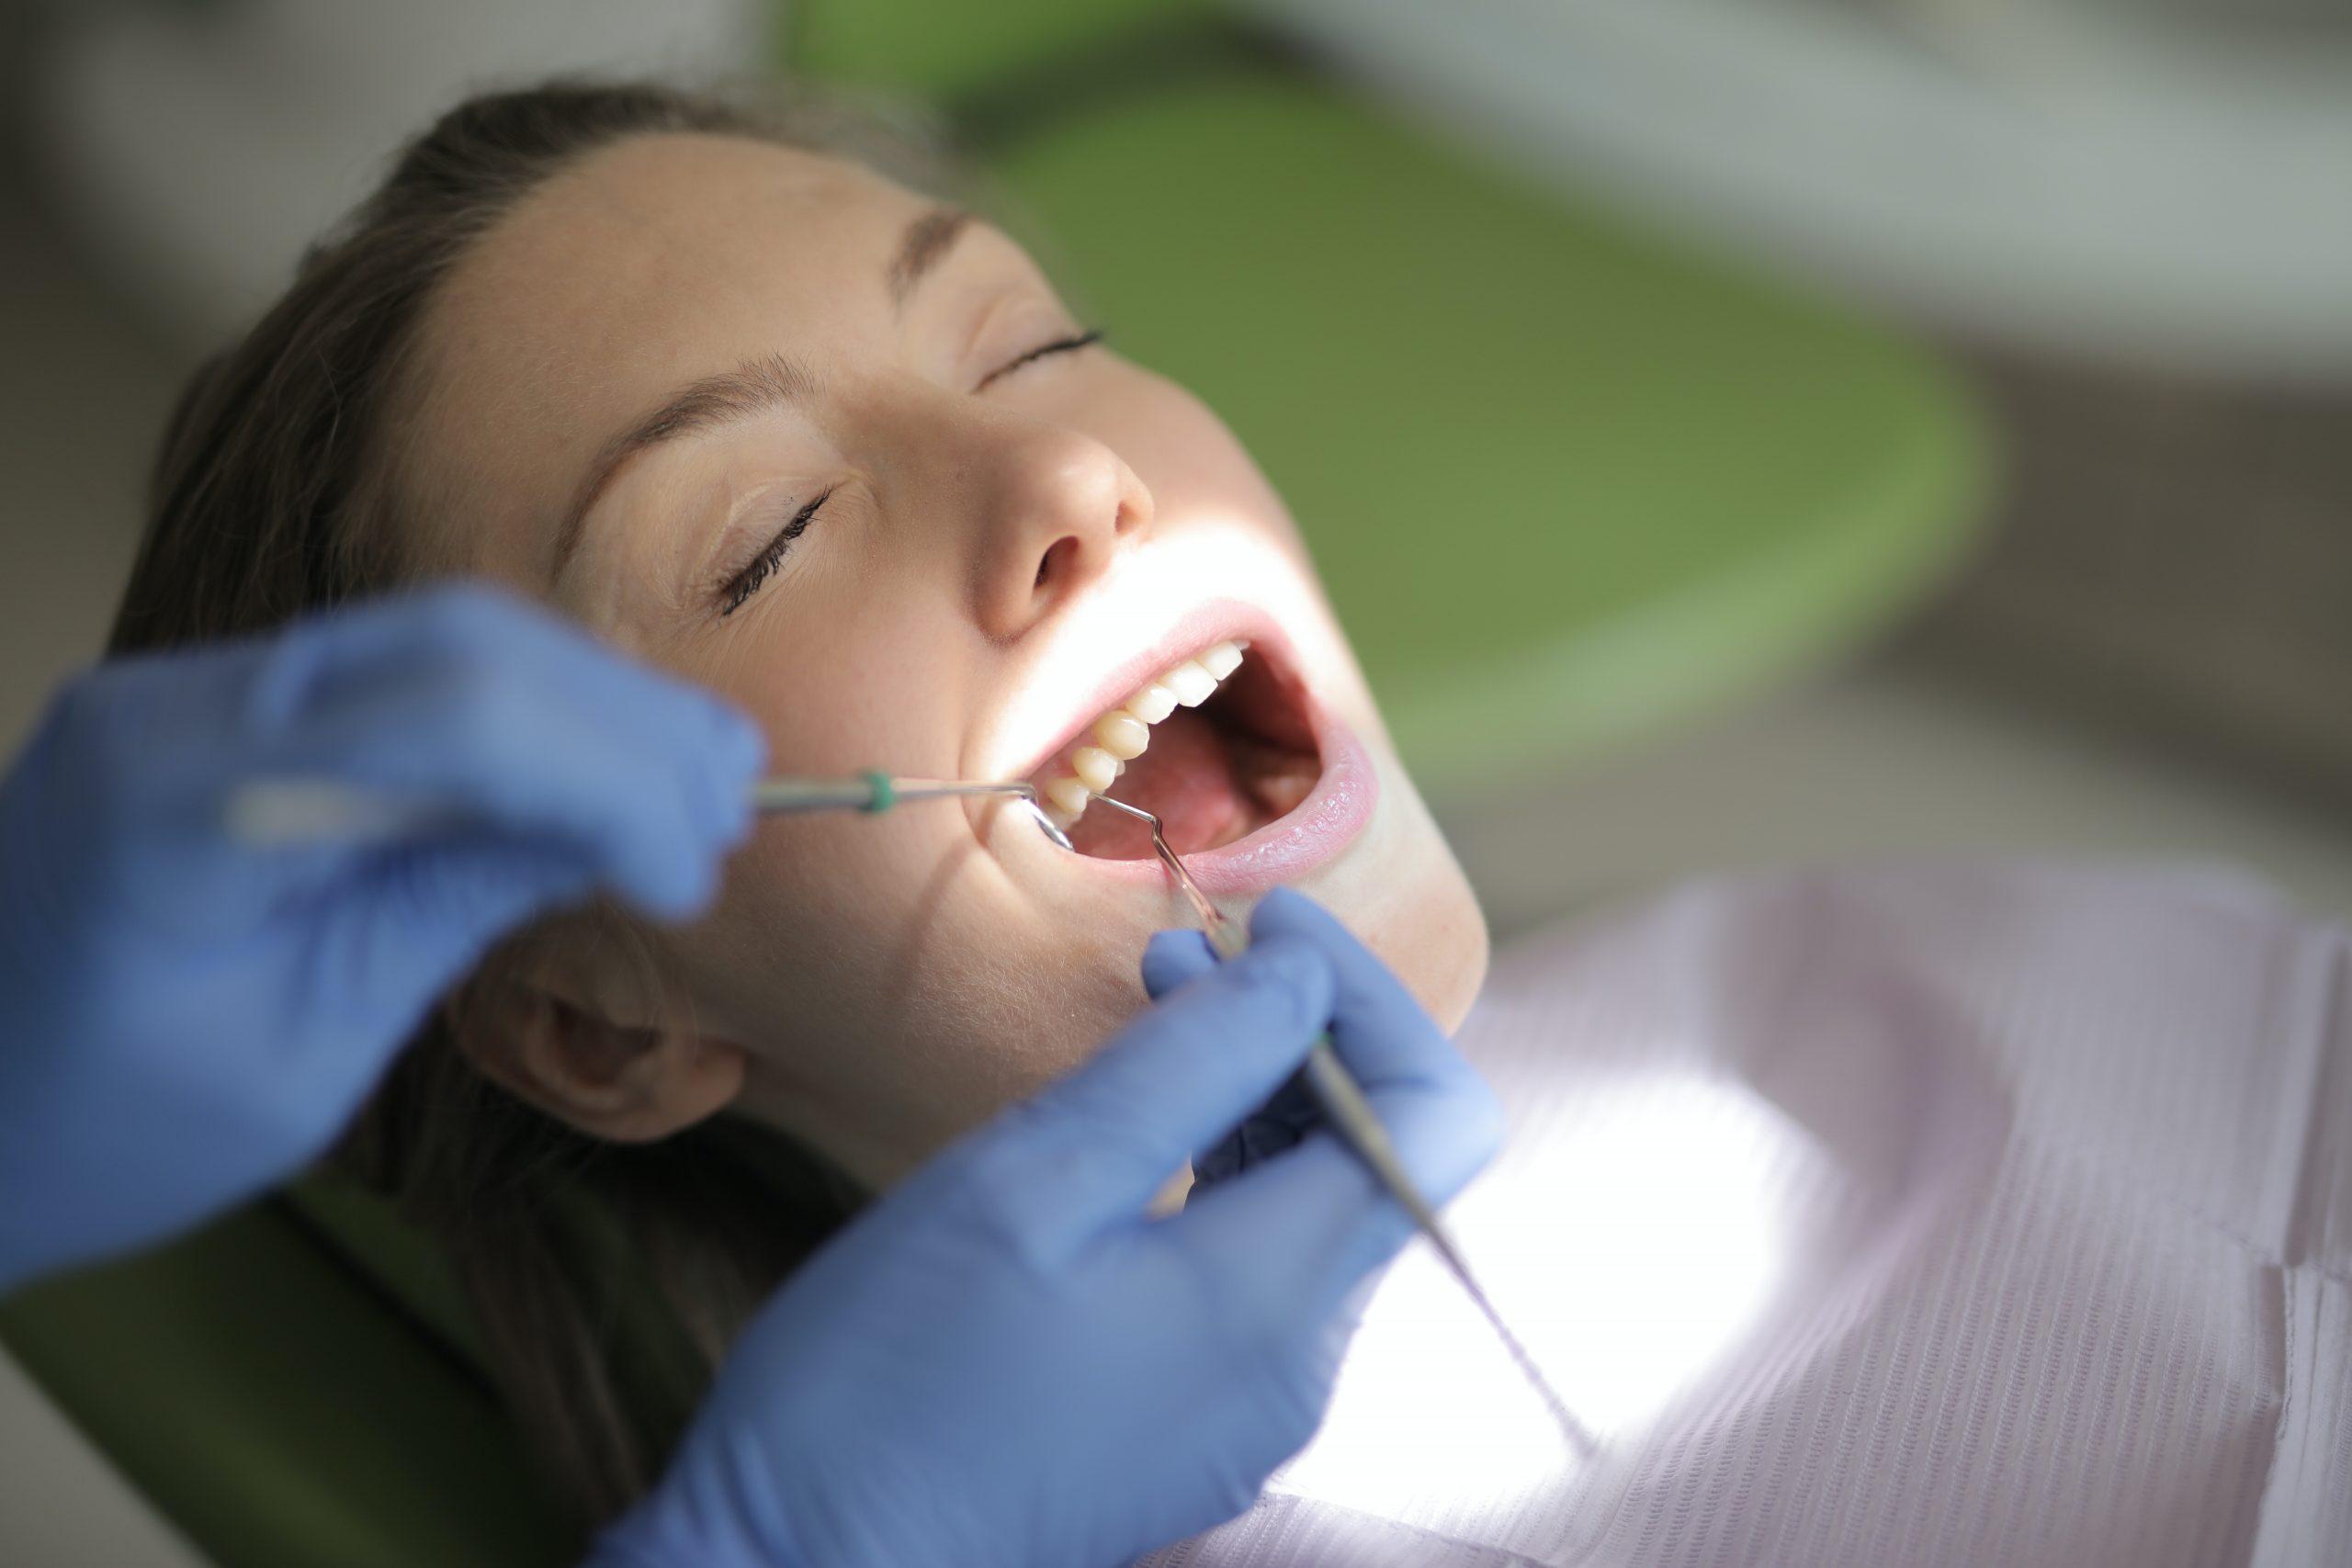 Dentist checking patient teeth